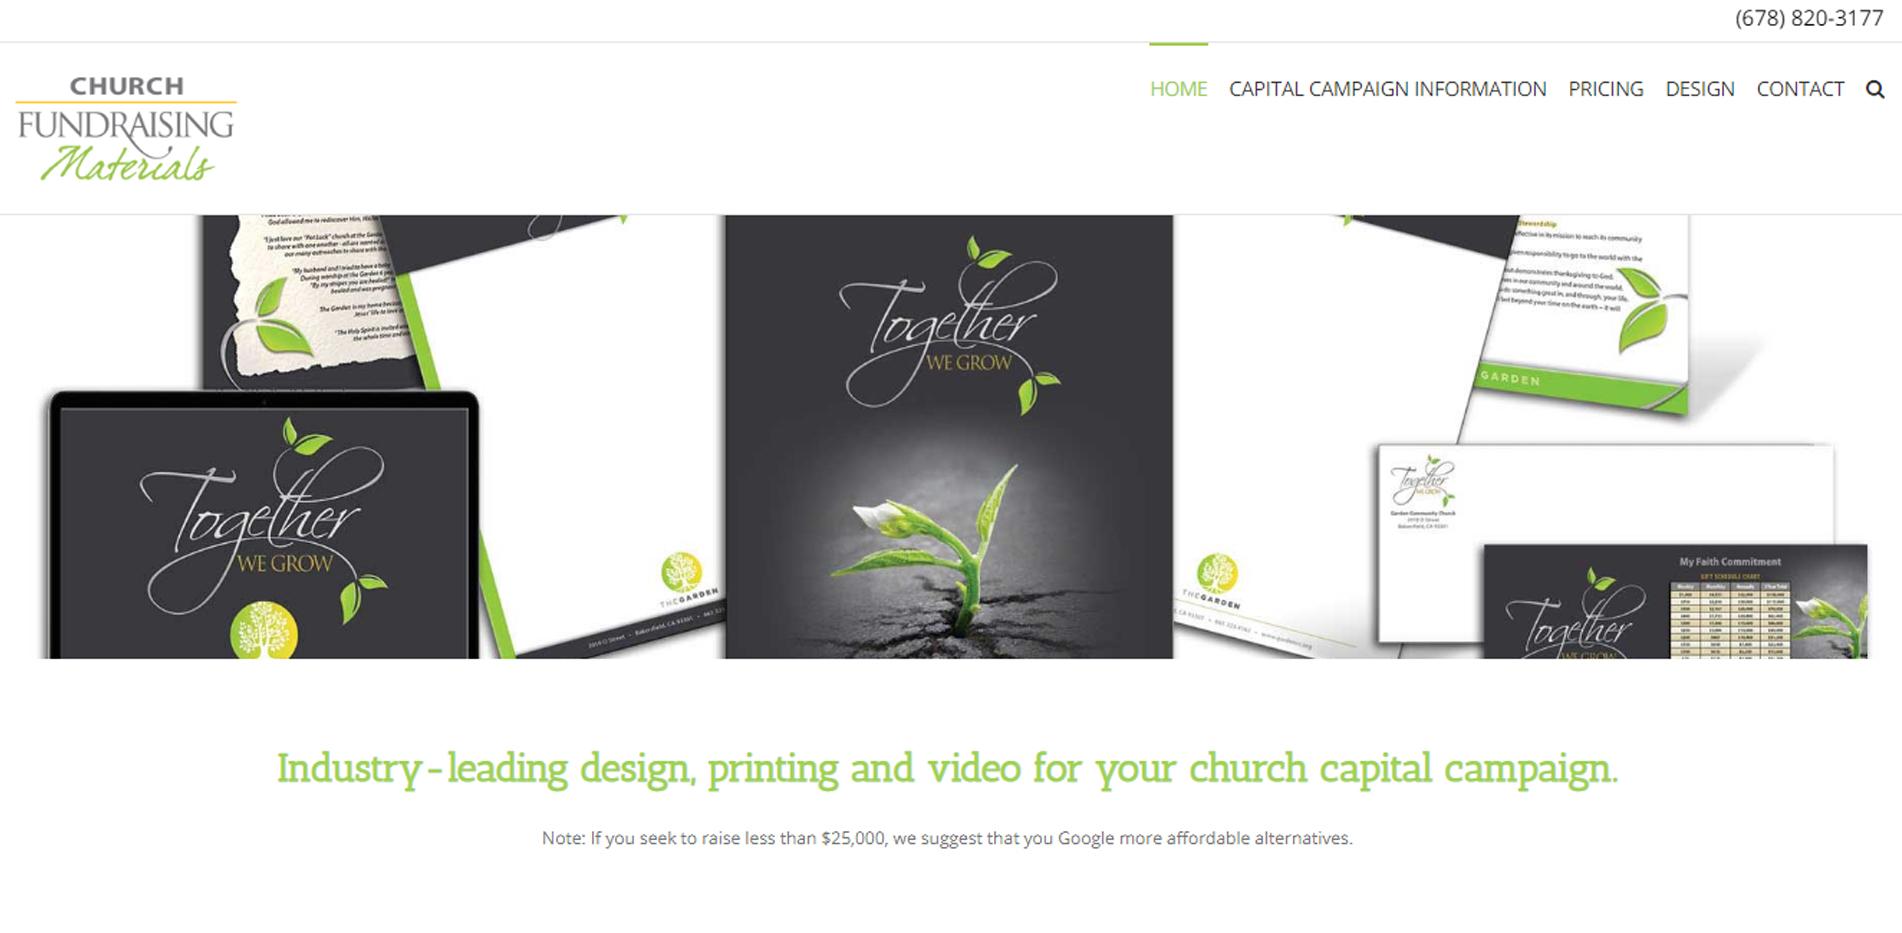 development | web design company | web designers | atlanta web design | companies | website design